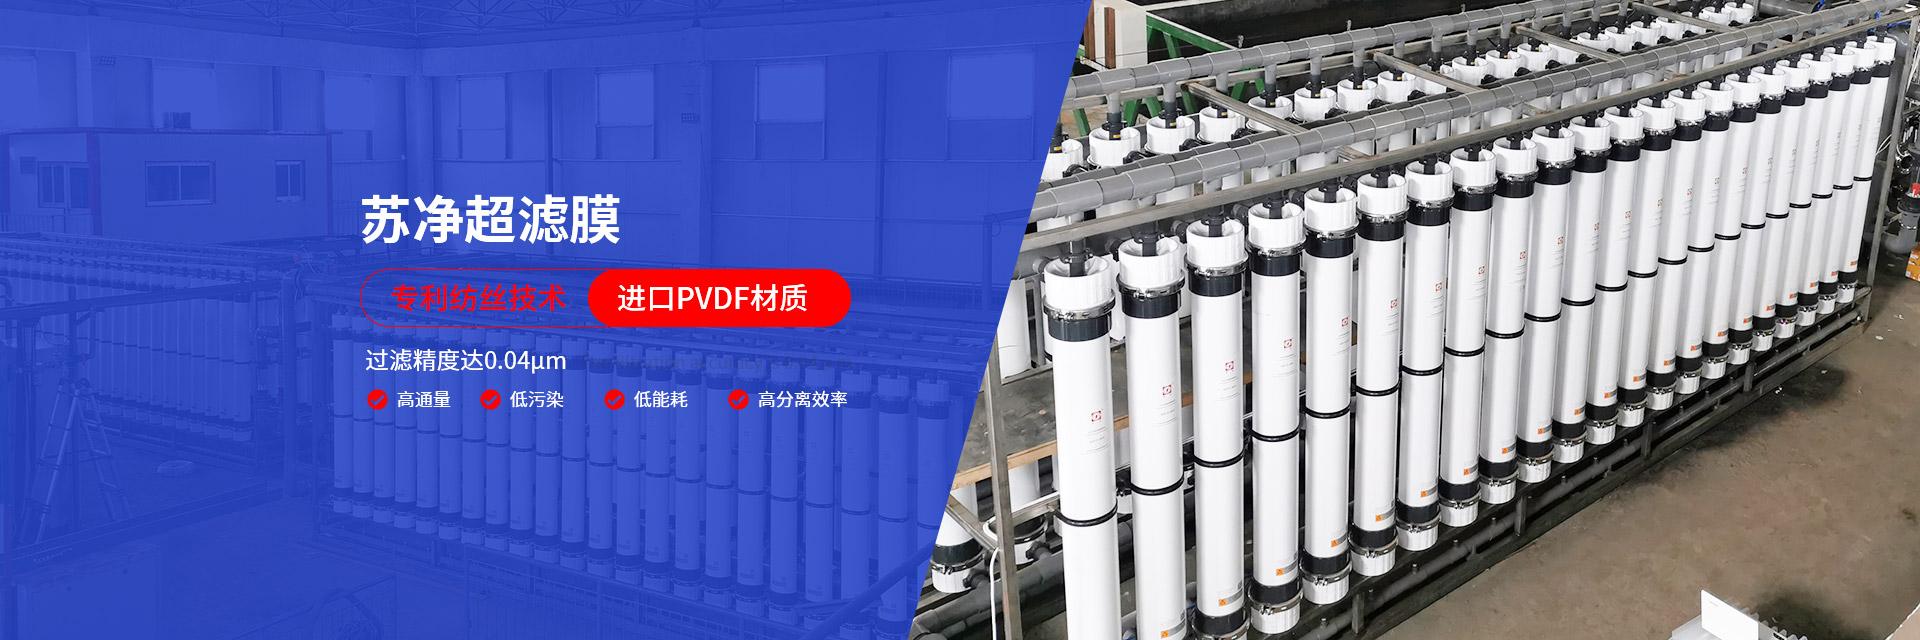 MBR膜,膜生物反应器,PVDF膜,超滤膜,中空纤维膜,MBR膜组件,MBR膜污水处理设备